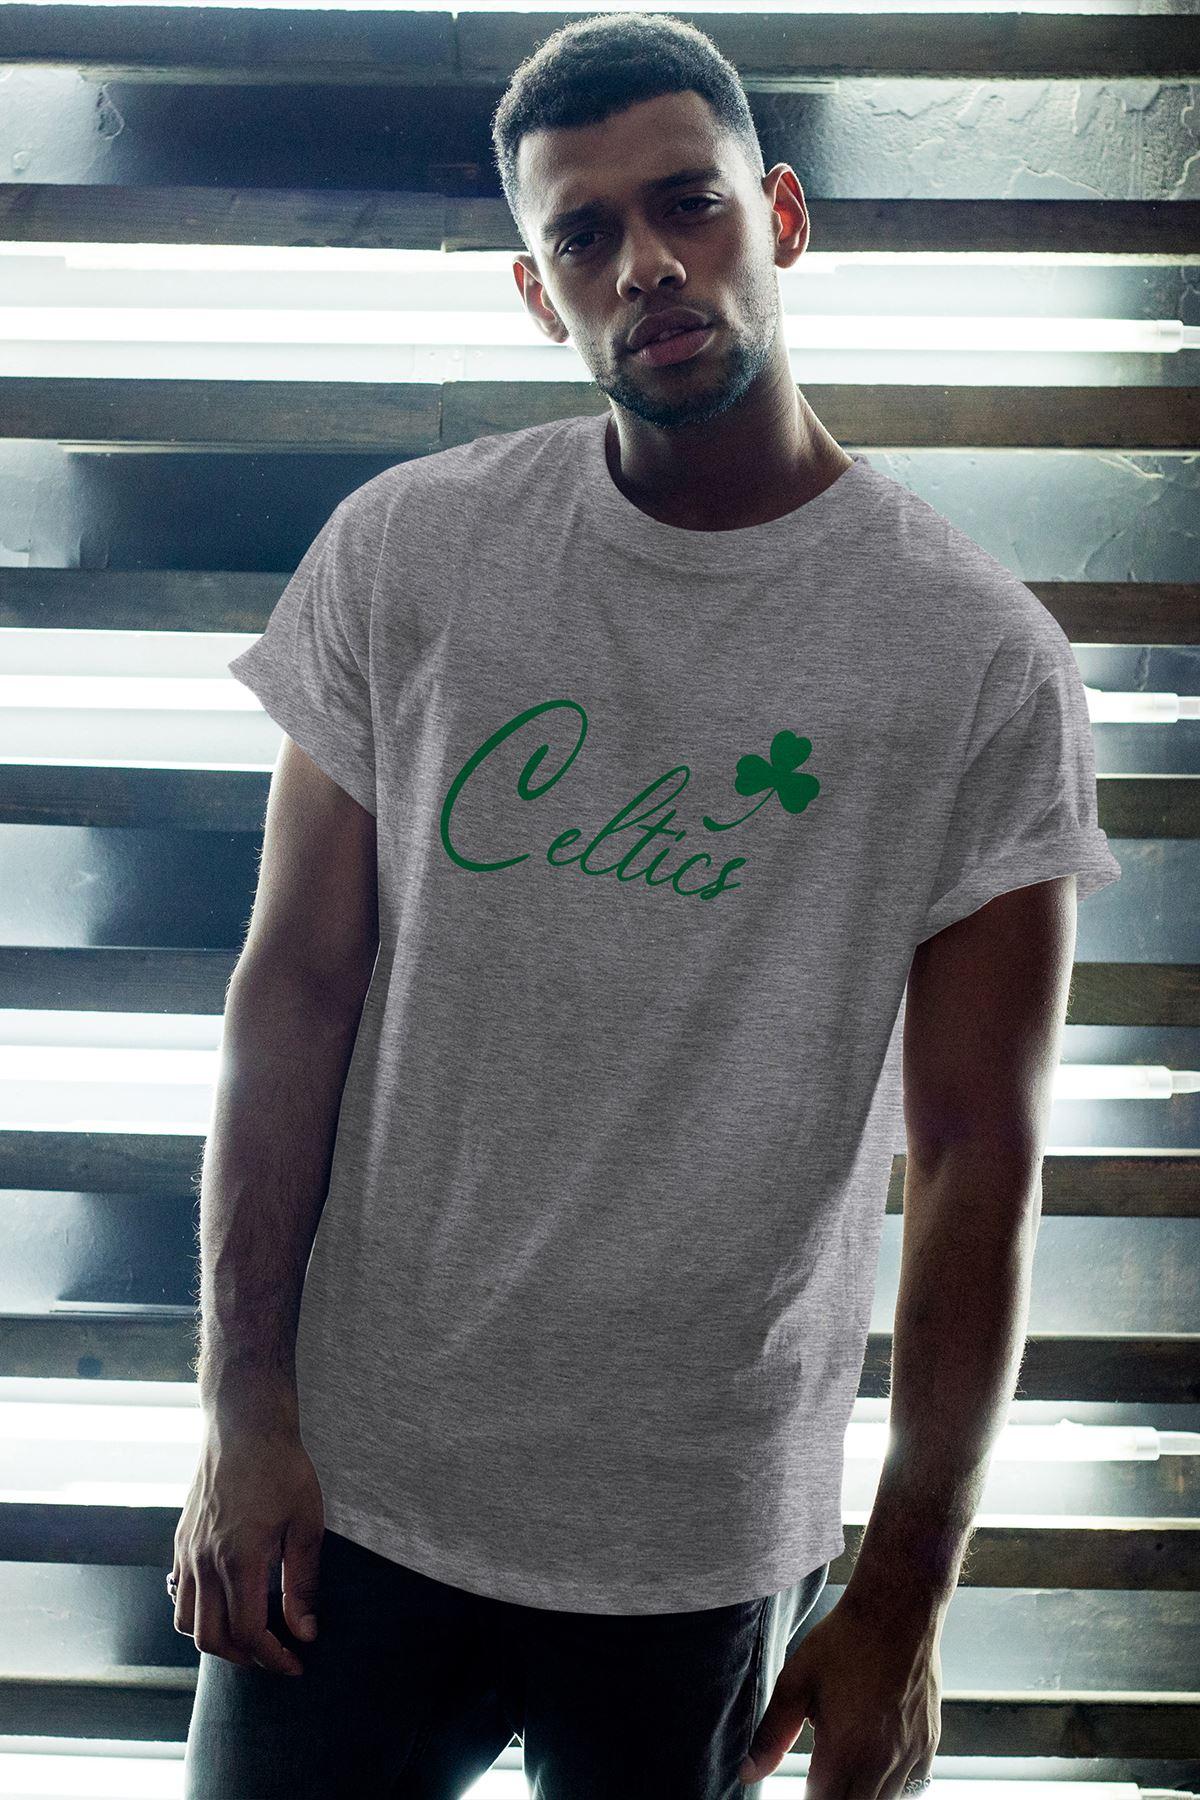 Boston Celtics 28 Gri Erkek Oversize Tshirt - Tişört